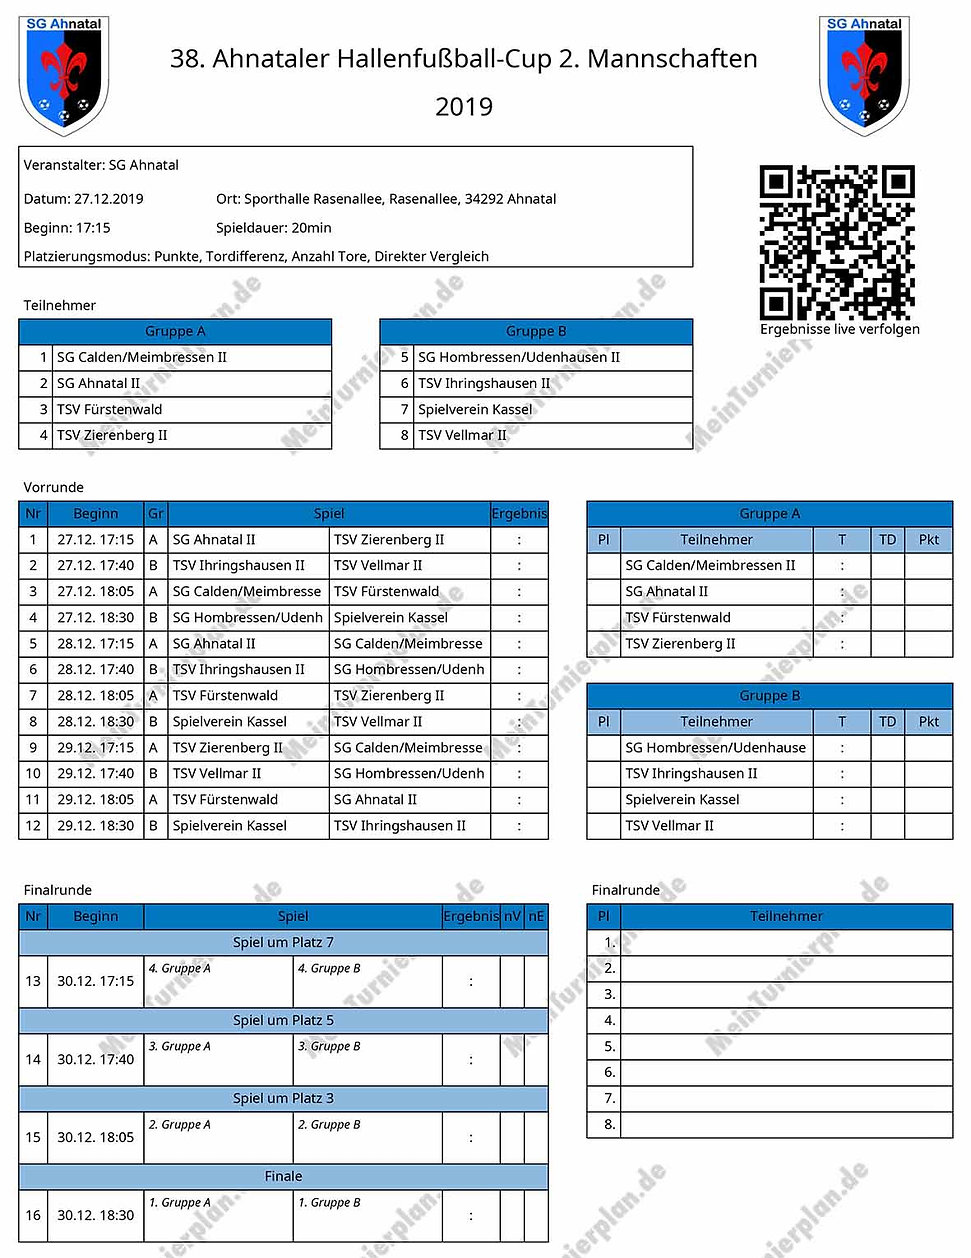 Internet_Spielplan 2 Mannschaften.jpg